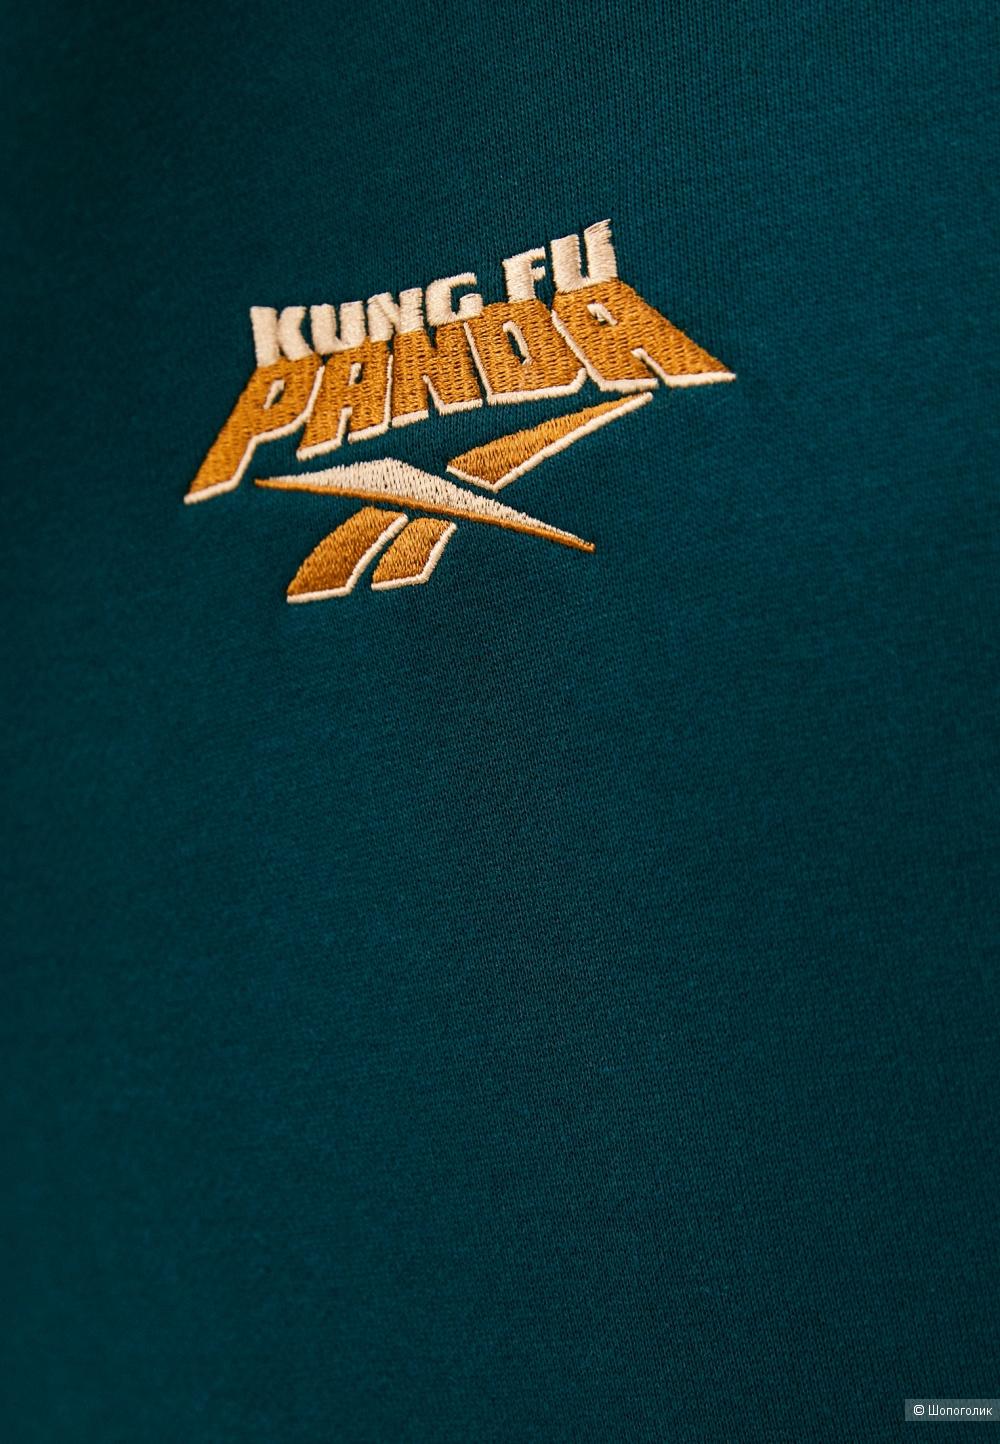 Худи Reebok Kung Fu Panda унисекс размер M